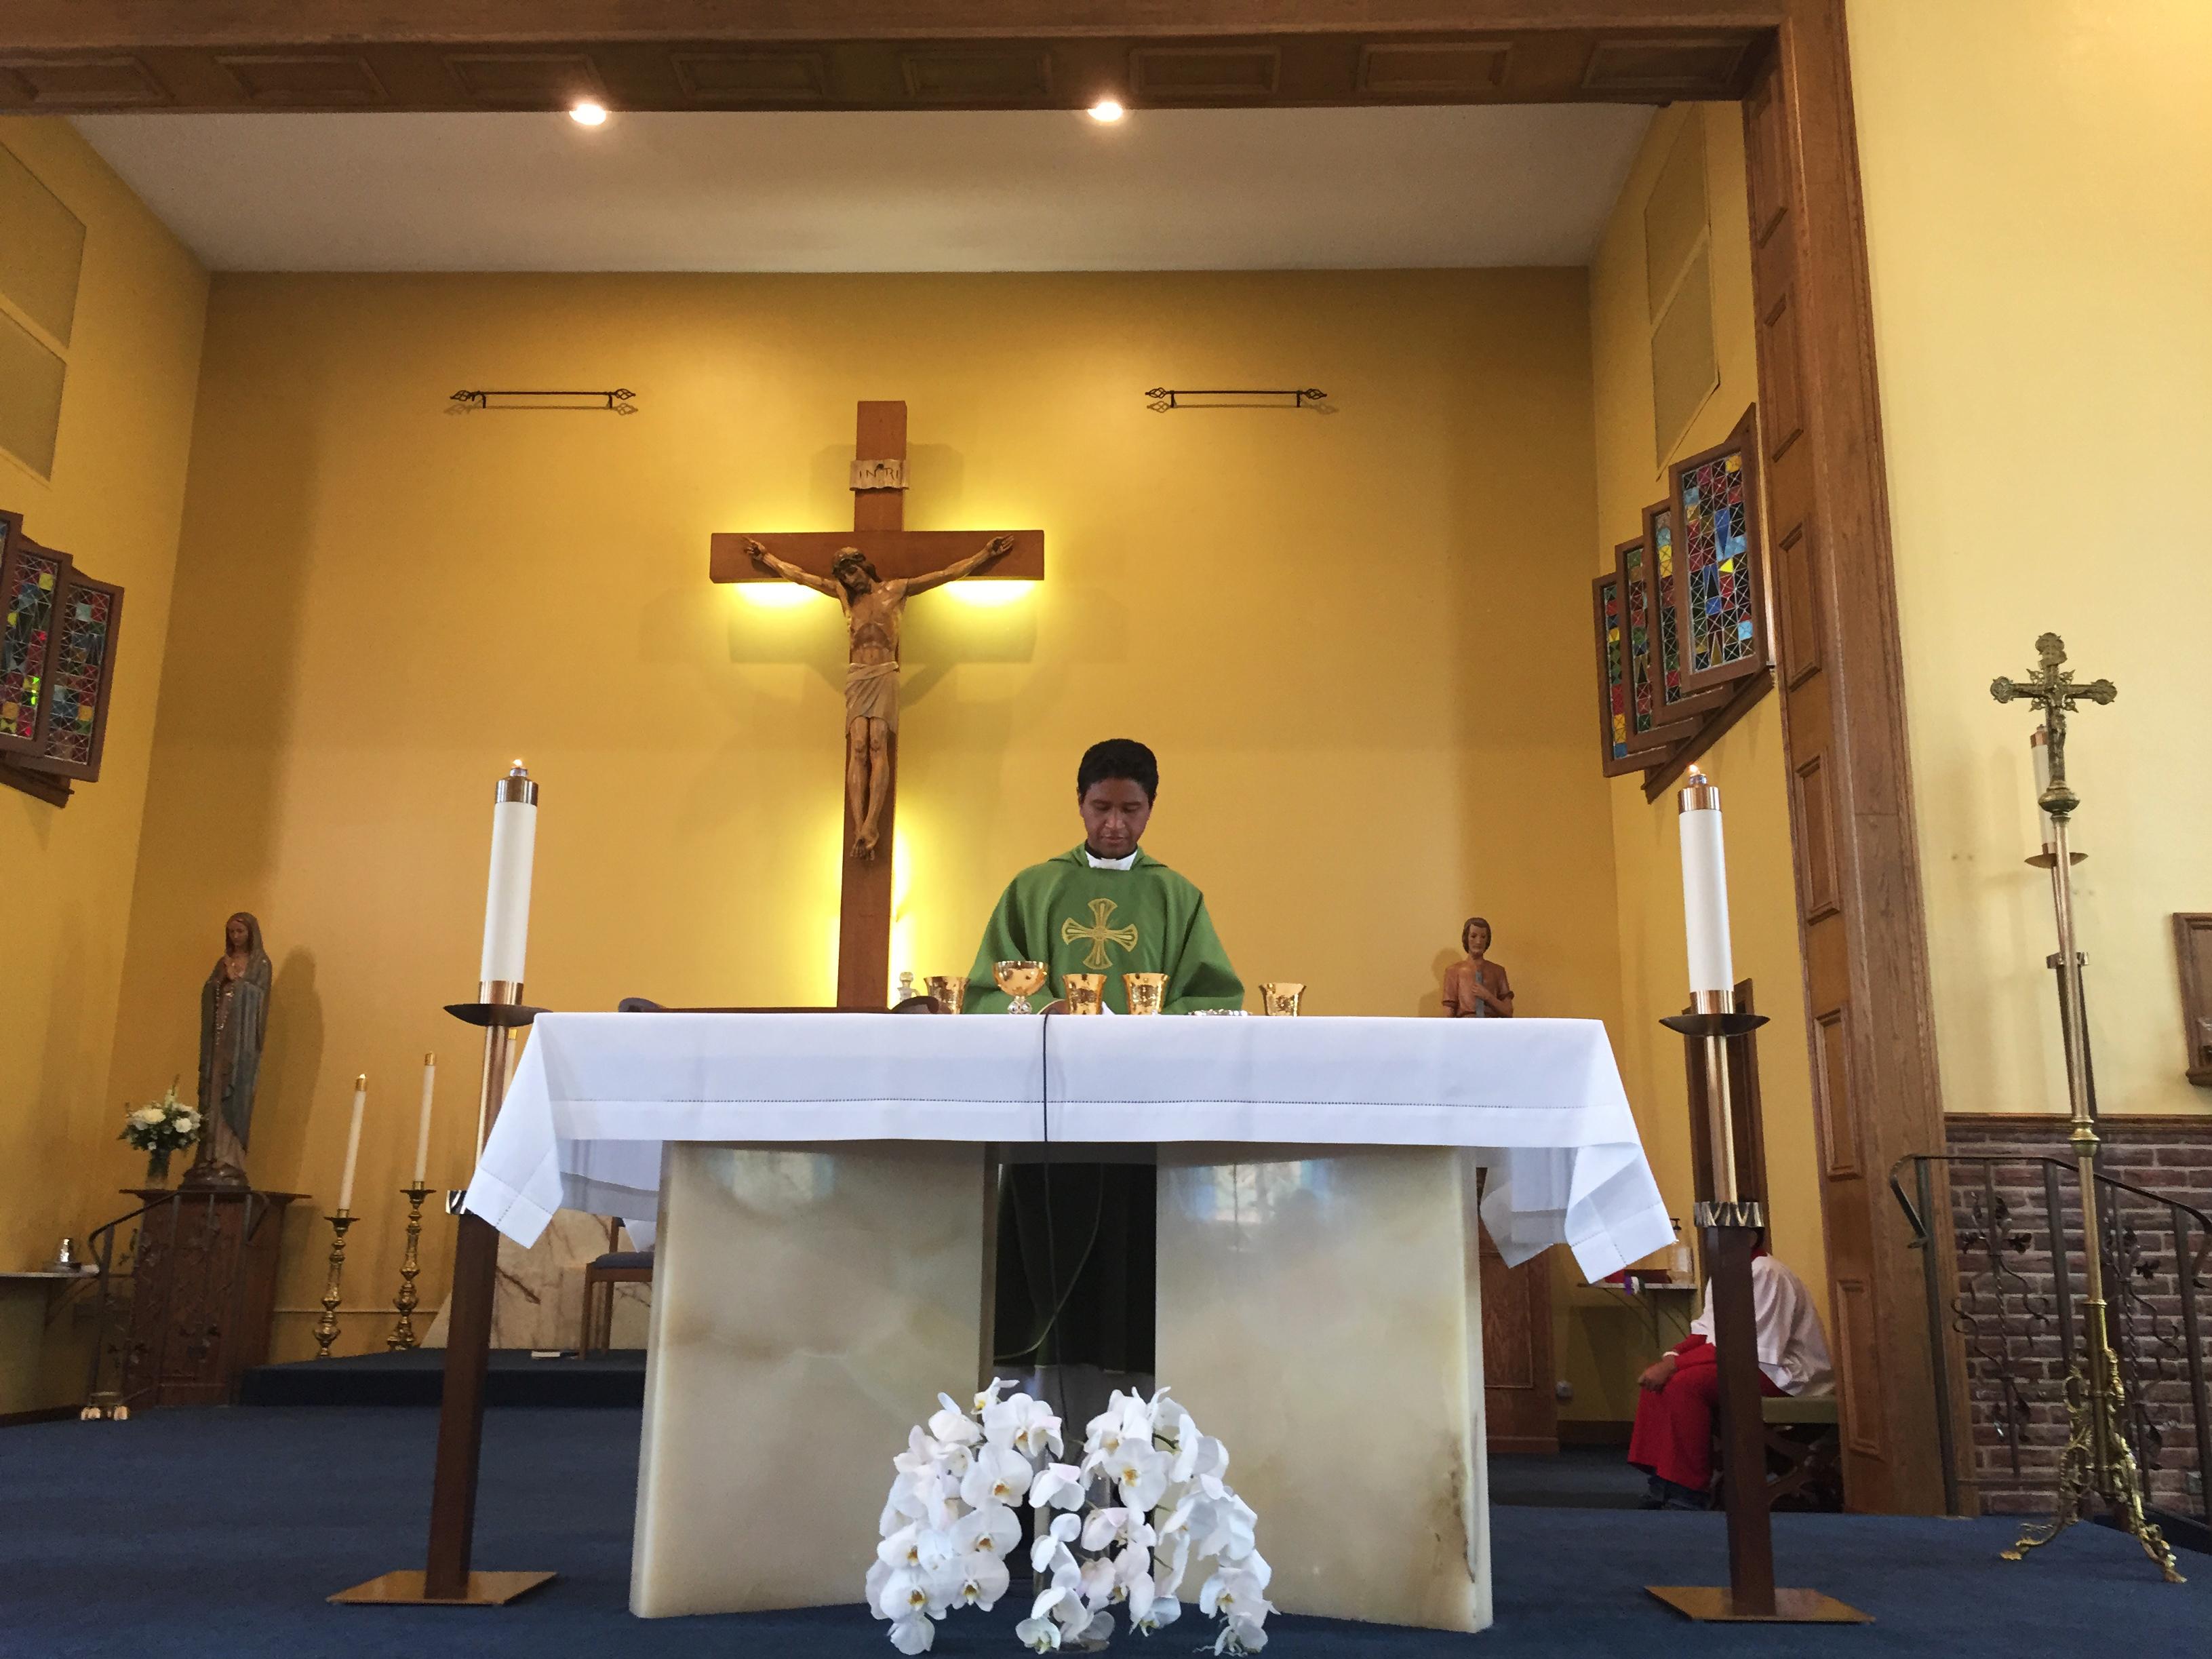 The Rev. Matthew Nathan celebrates a Spanish-language Mass at St. Alexis. (David Schaper/NPR)